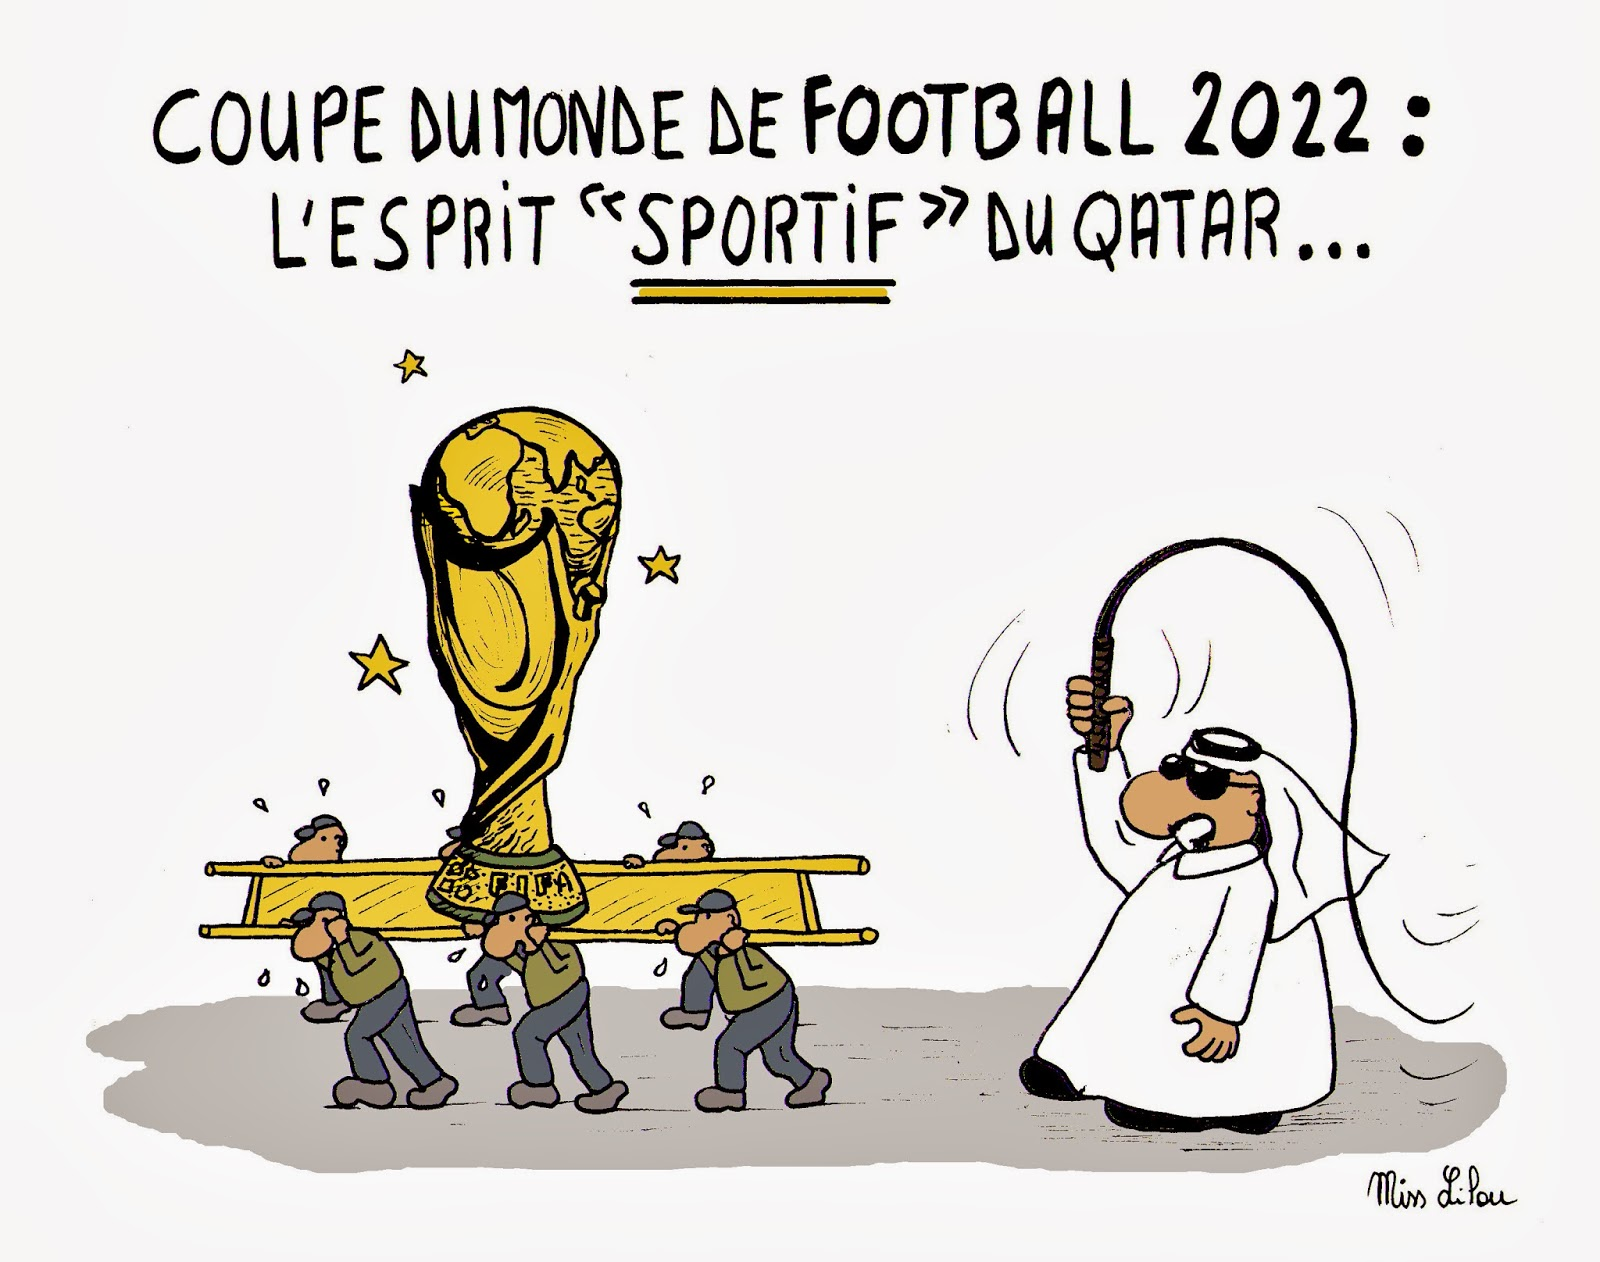 image drole qatar